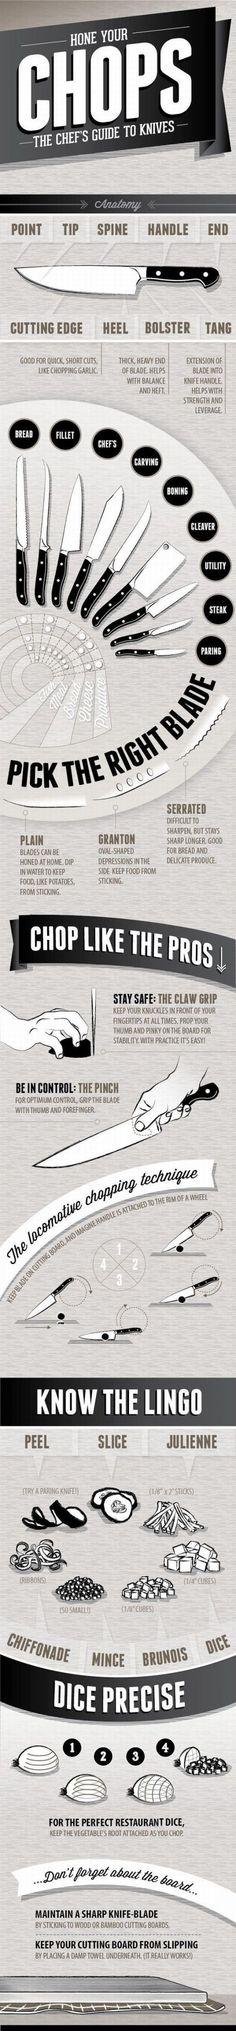 @Charlie McDermott Can't WAIT for summer culinary school! Knife Skills